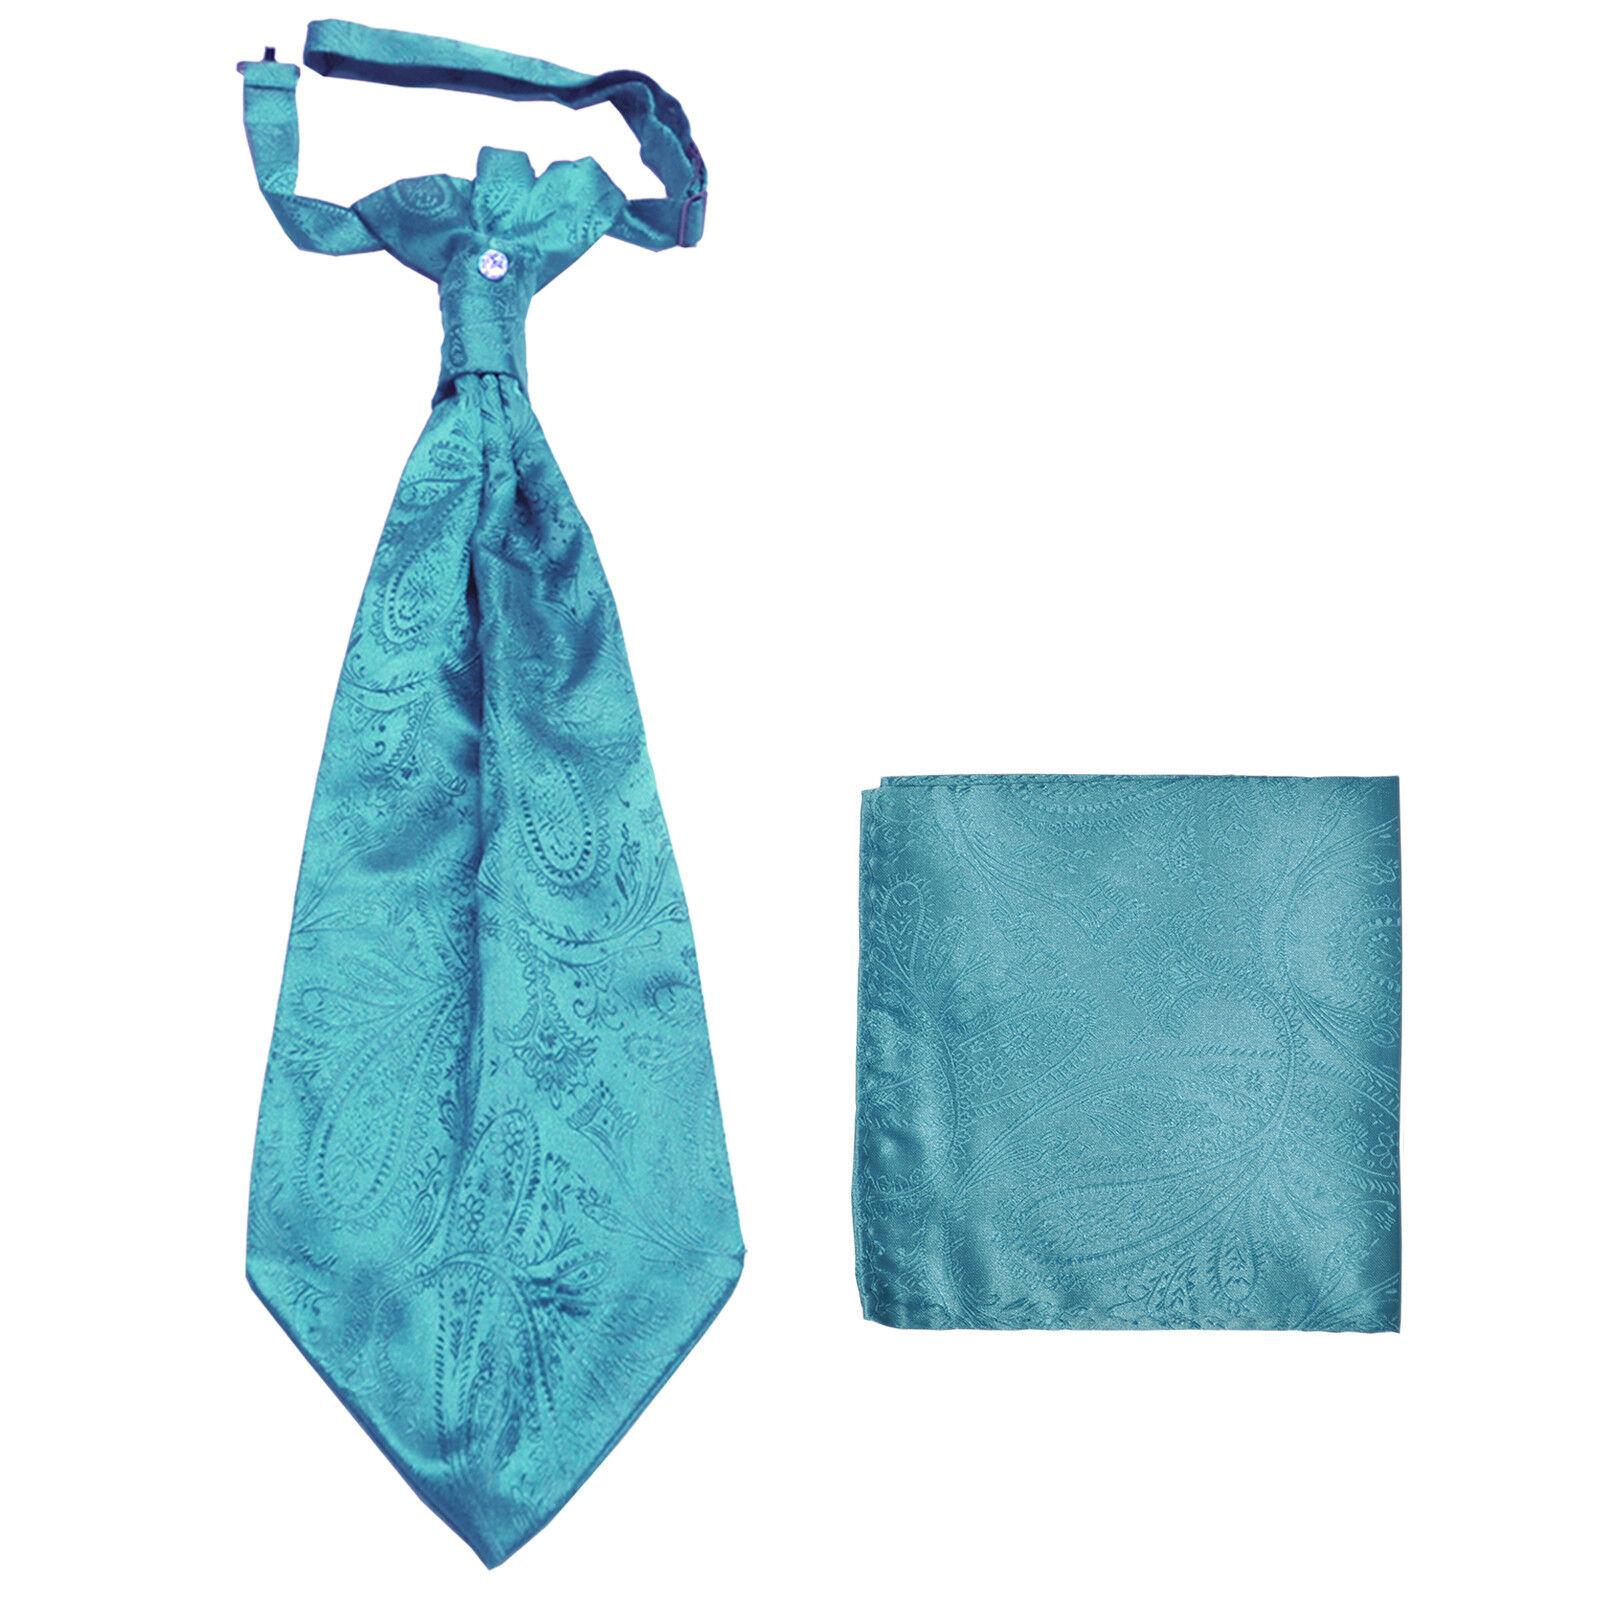 New men's polyester ASCOT cravat neck tie & hankie set Turquoise blue Paisley